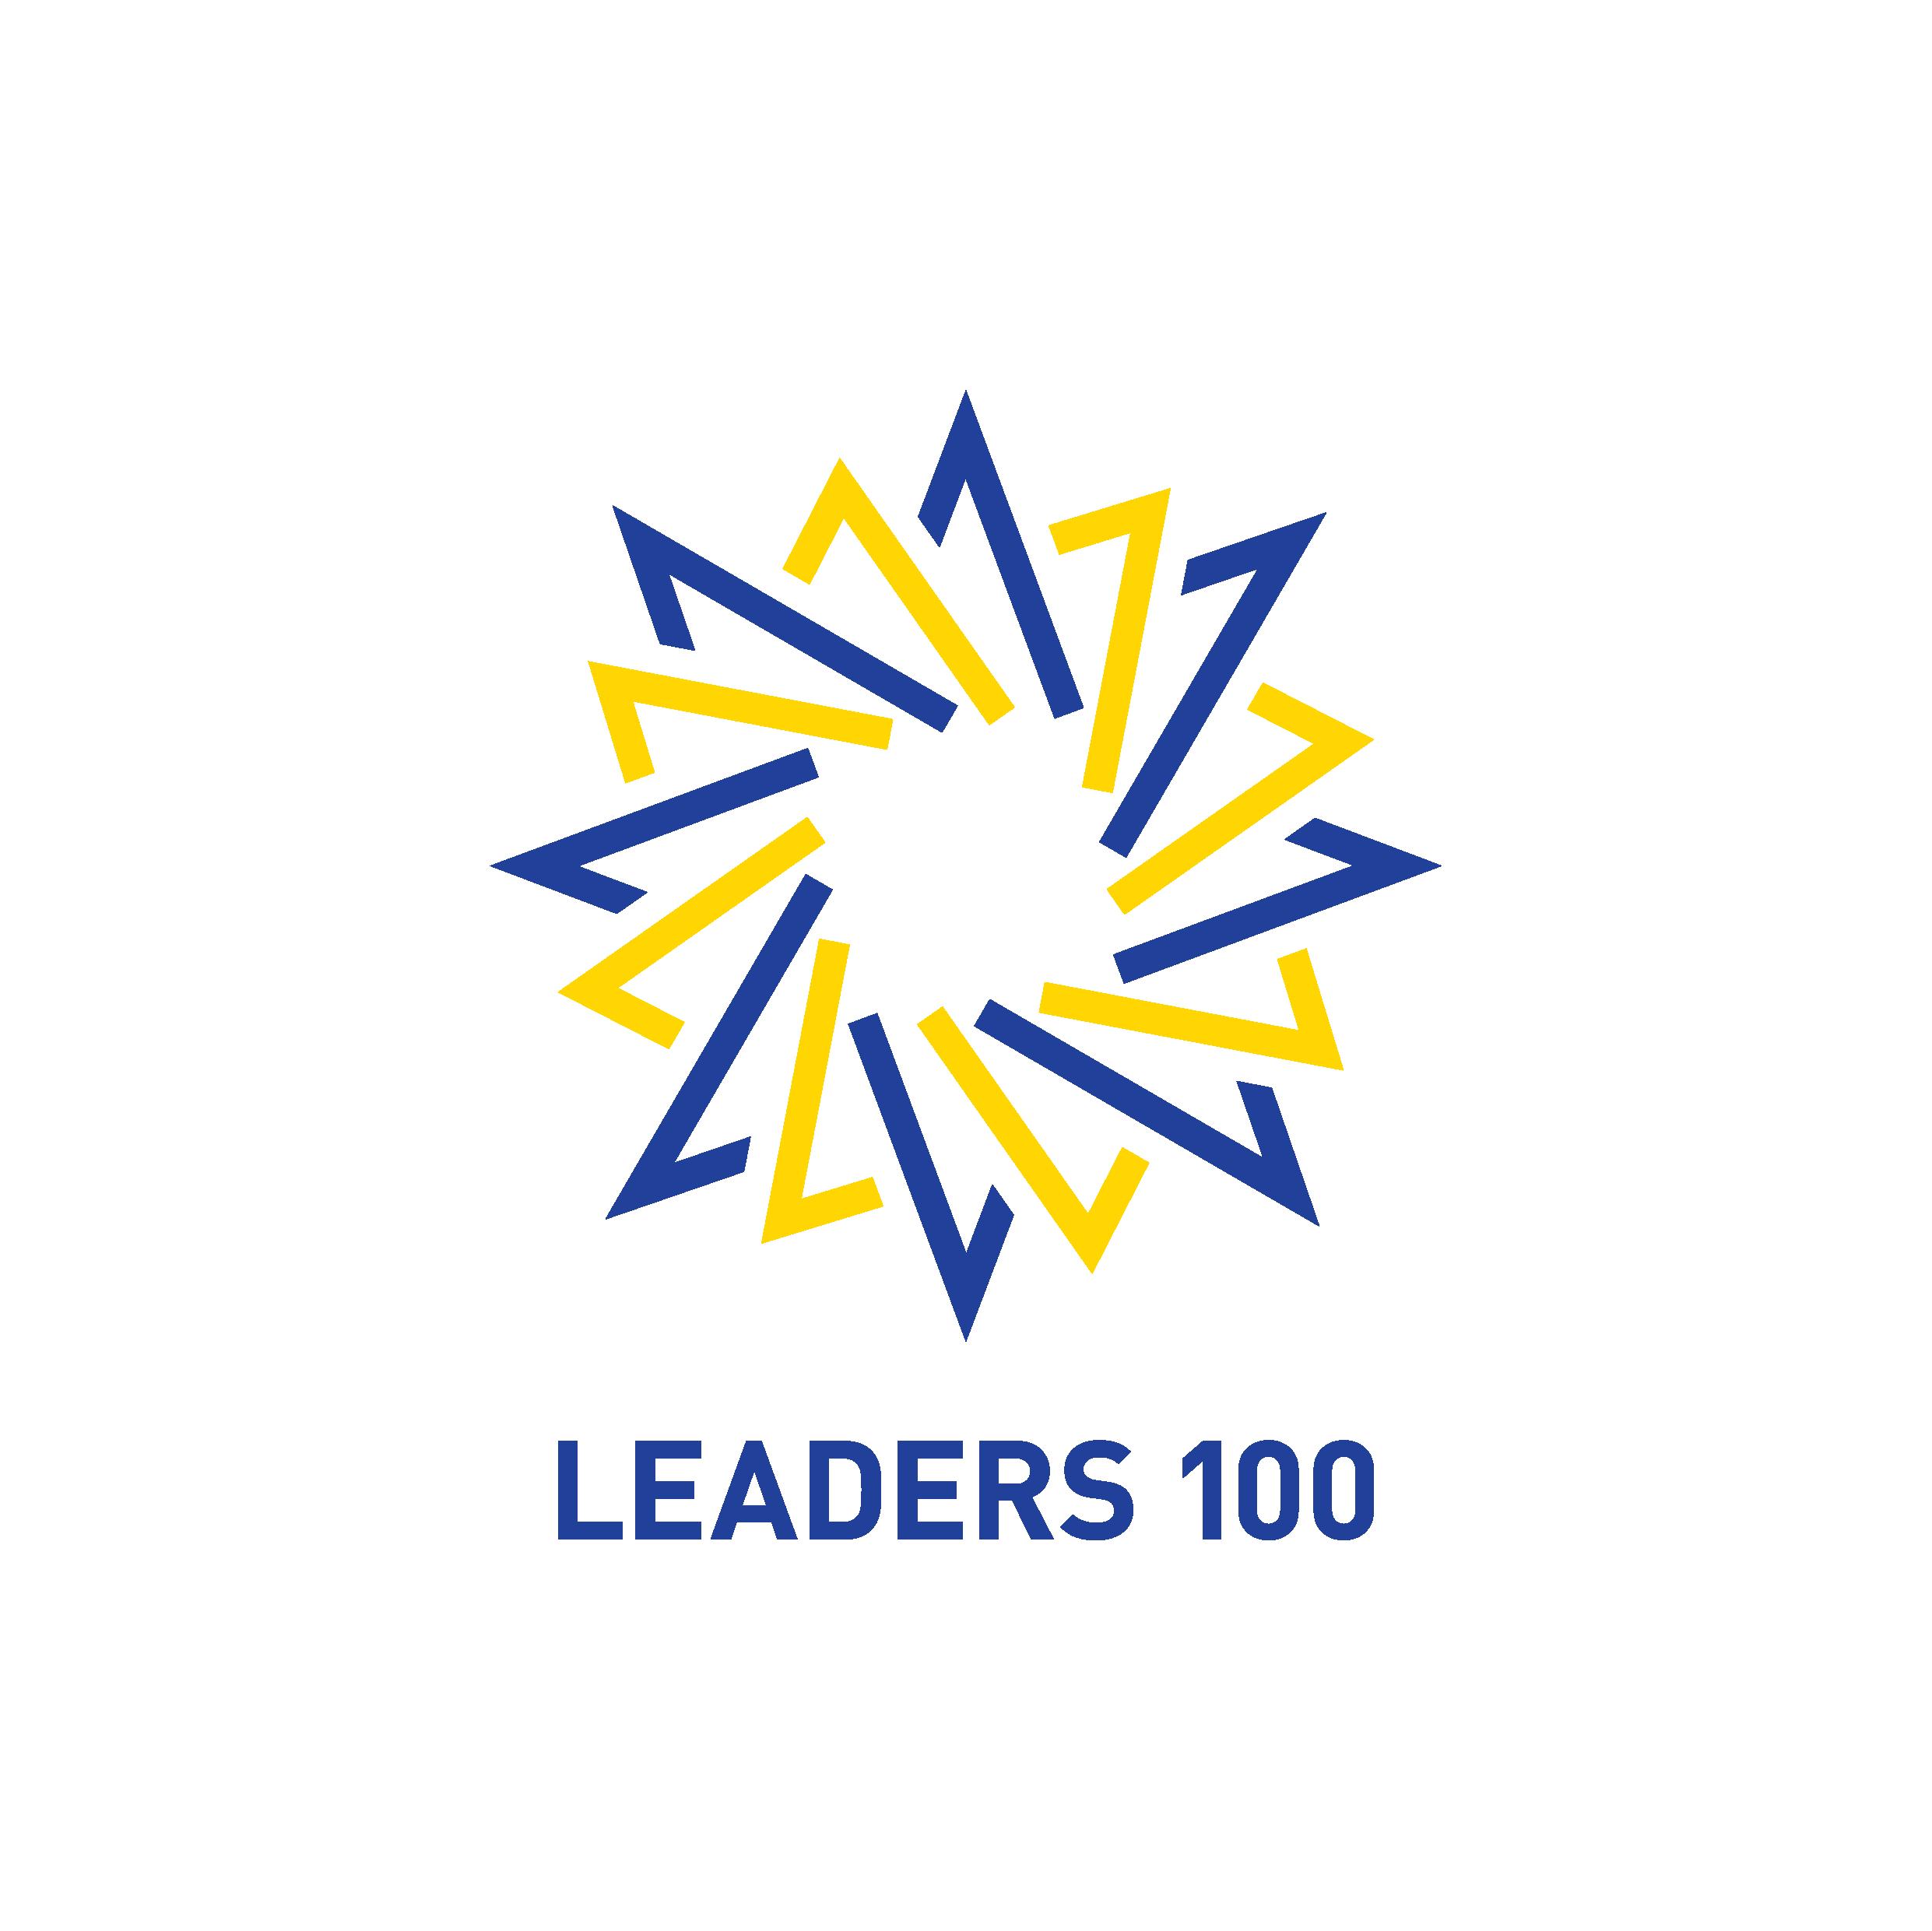 領袖 100 Logo